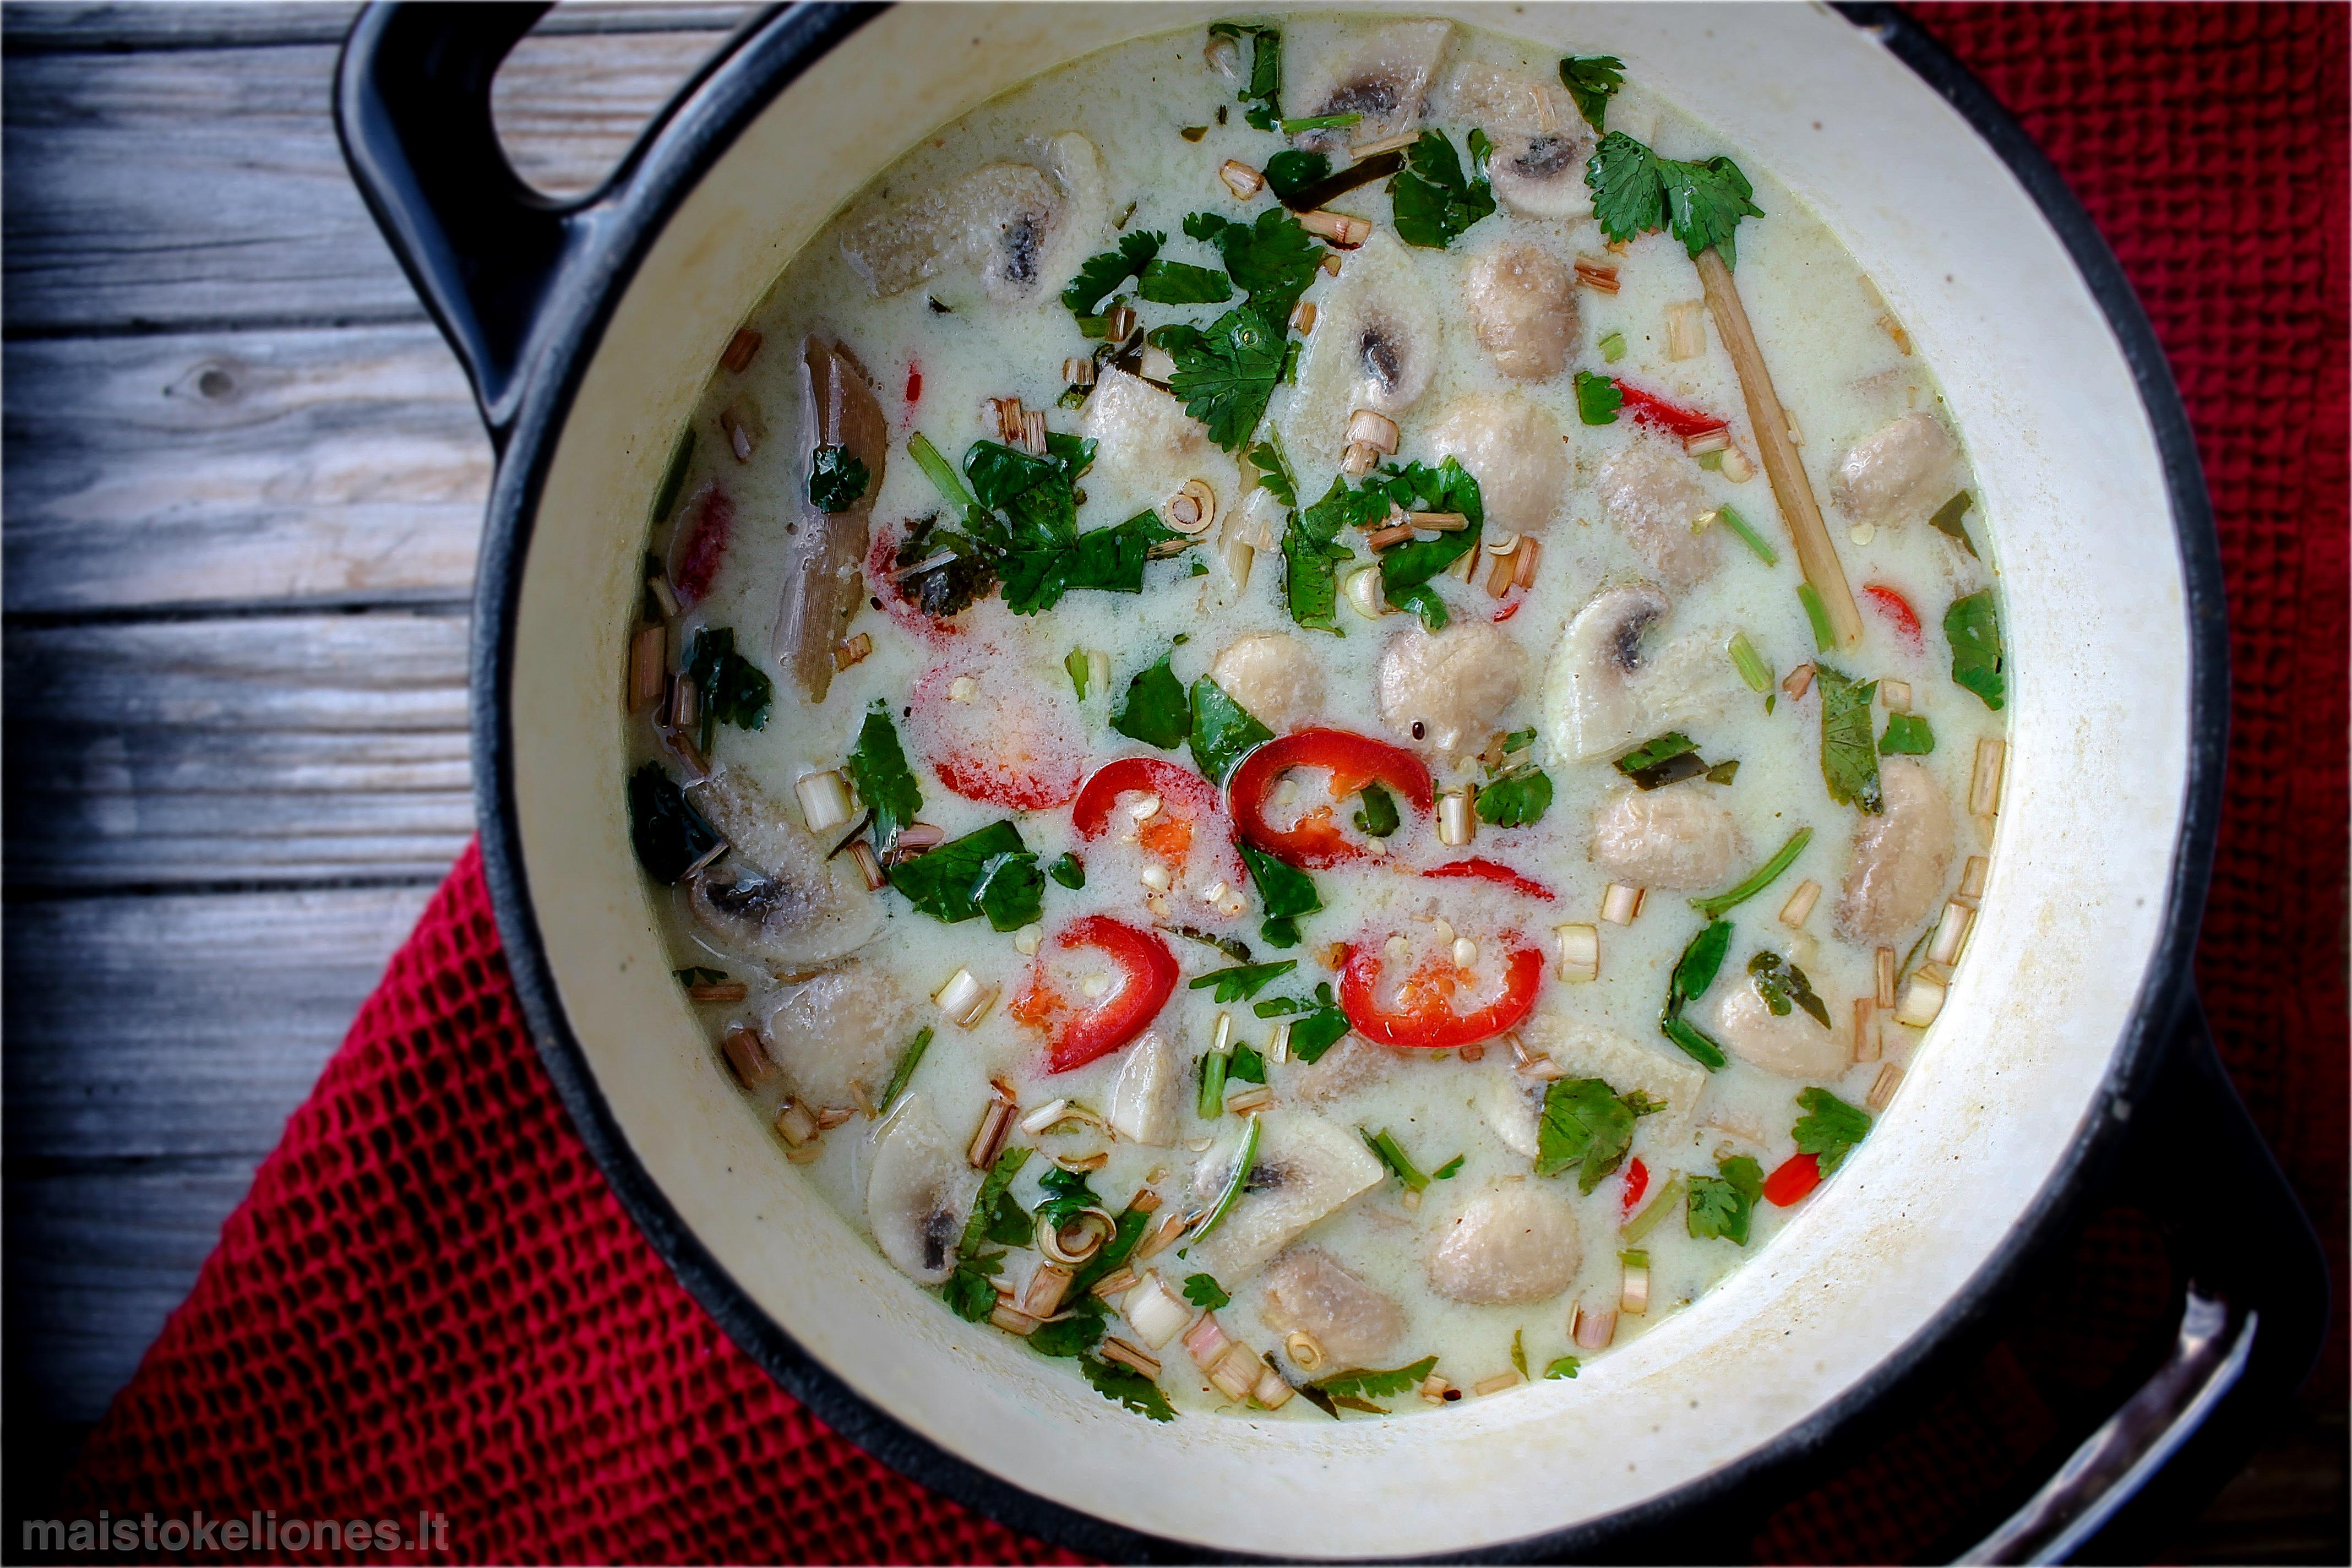 Tom Kha Gai sriuba